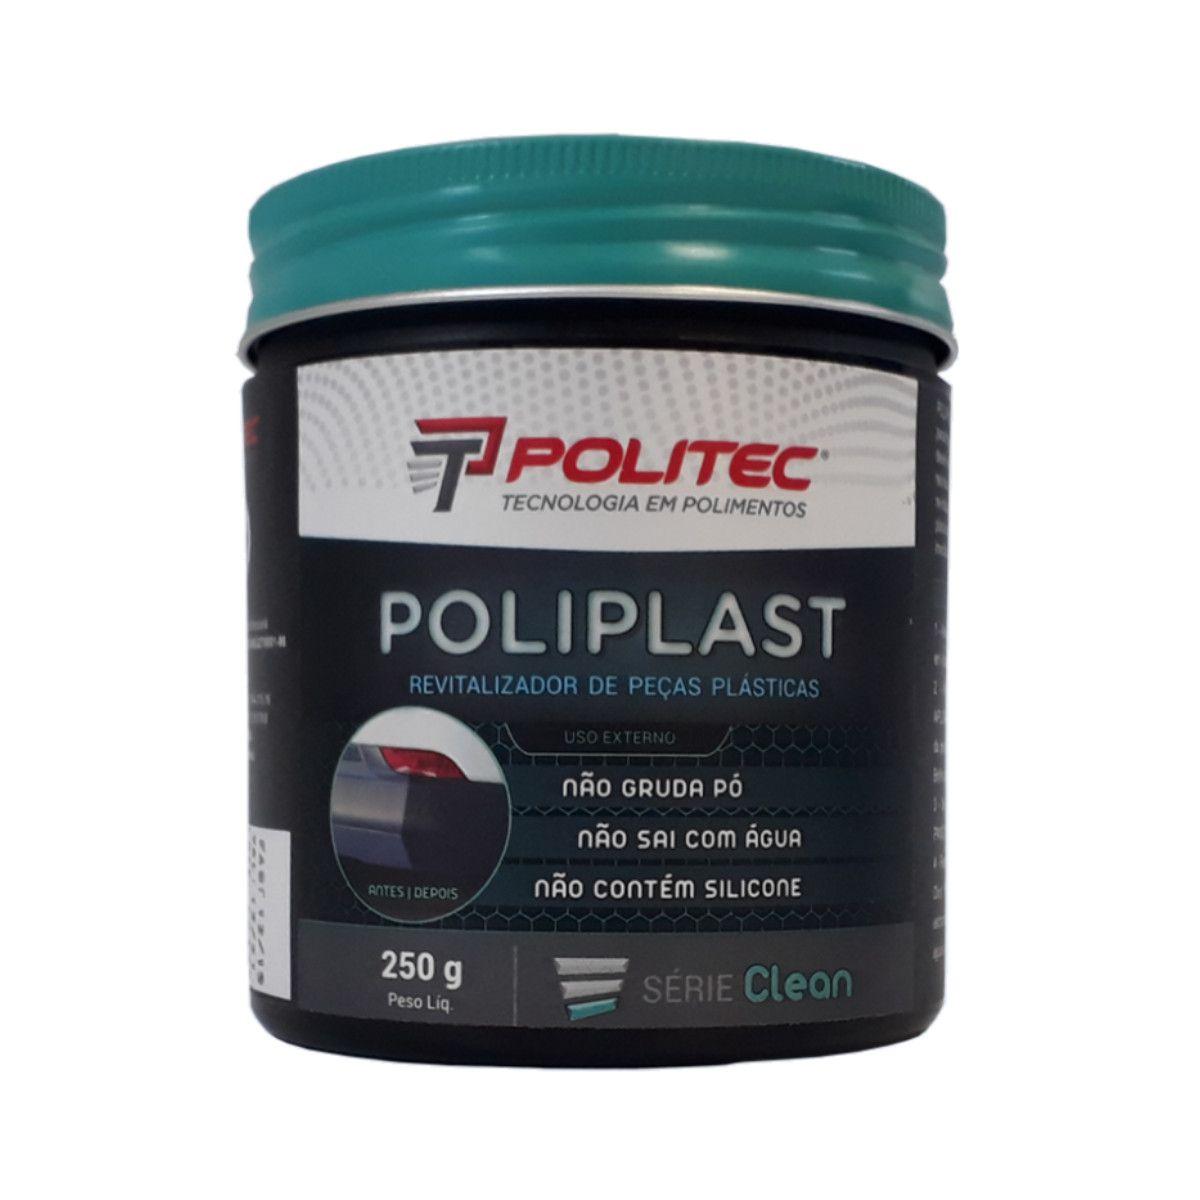 Poliplast Pasta Revitalizadora P/ Plásticos 250g Politec